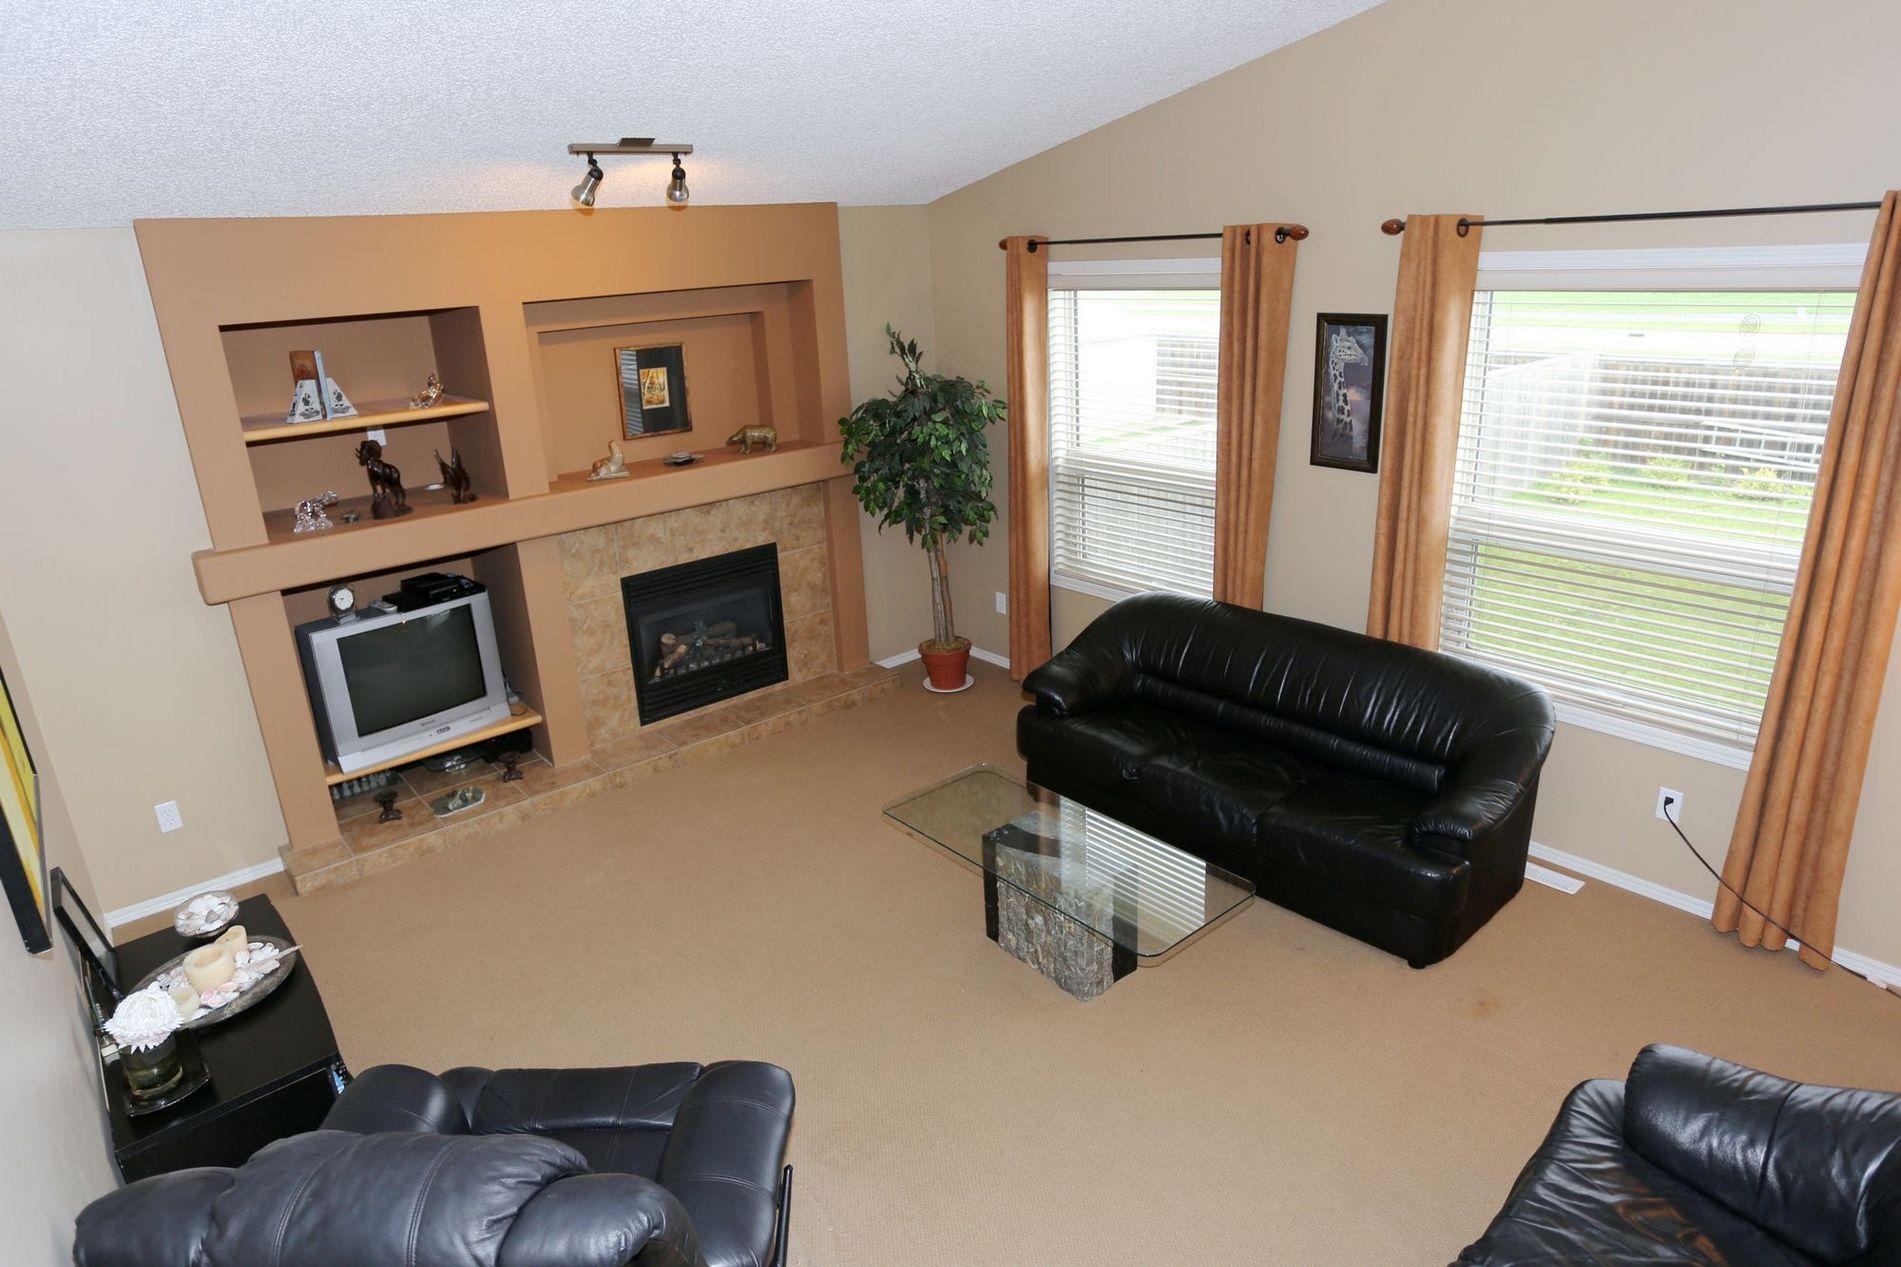 15 Nordstrom Drive, Winnipeg, Manitoba  R3X 0A5 - Photo 3 - 1524618